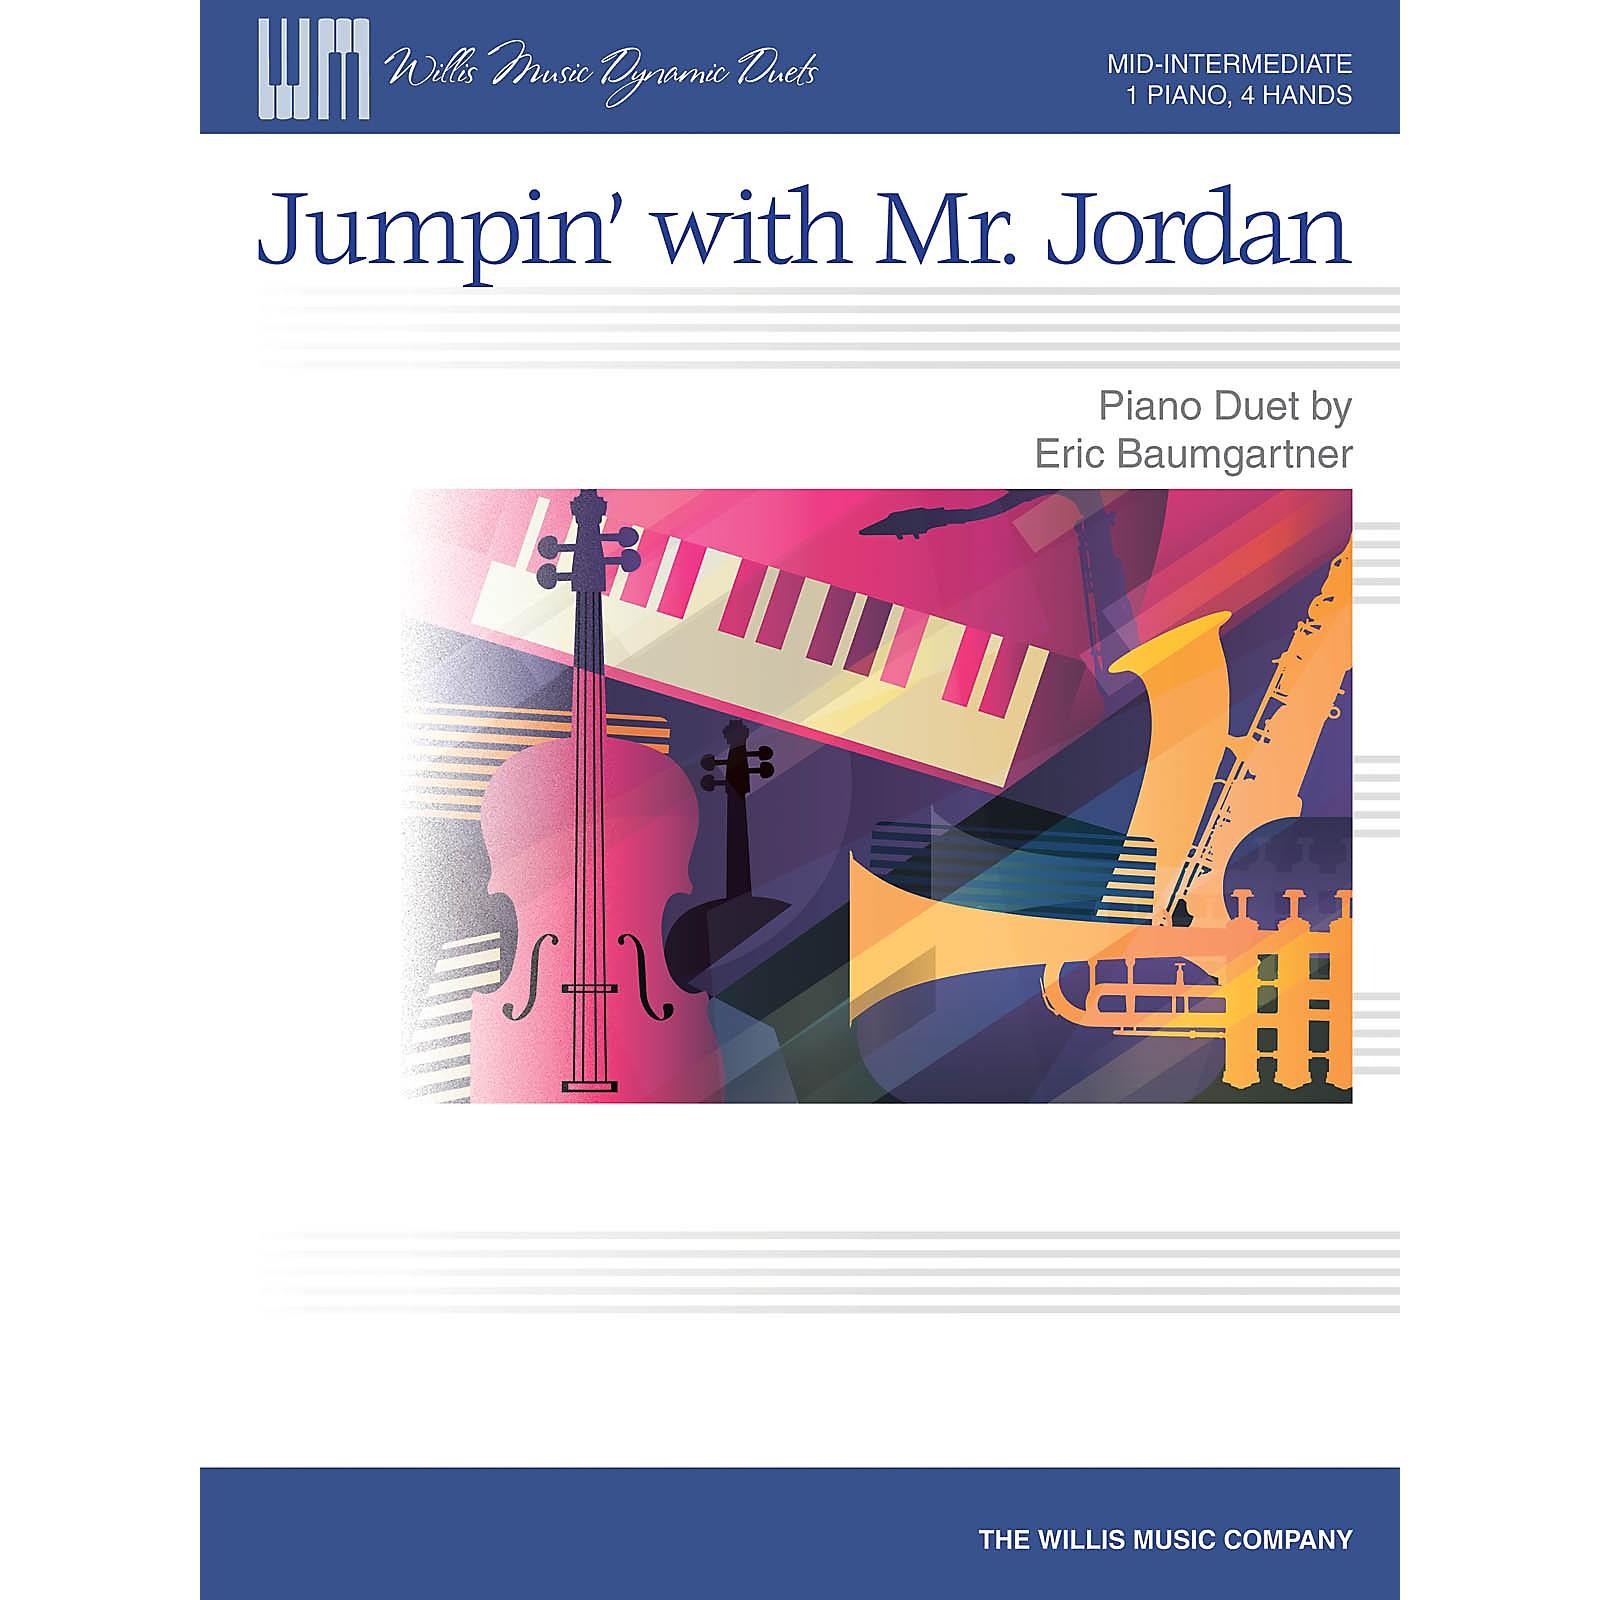 Willis Music Jumpin' with Mr. Jordan - Mid-Intermediate Level Piano Duet - 1 Piano, 4 Hands by Eric Baumgartner